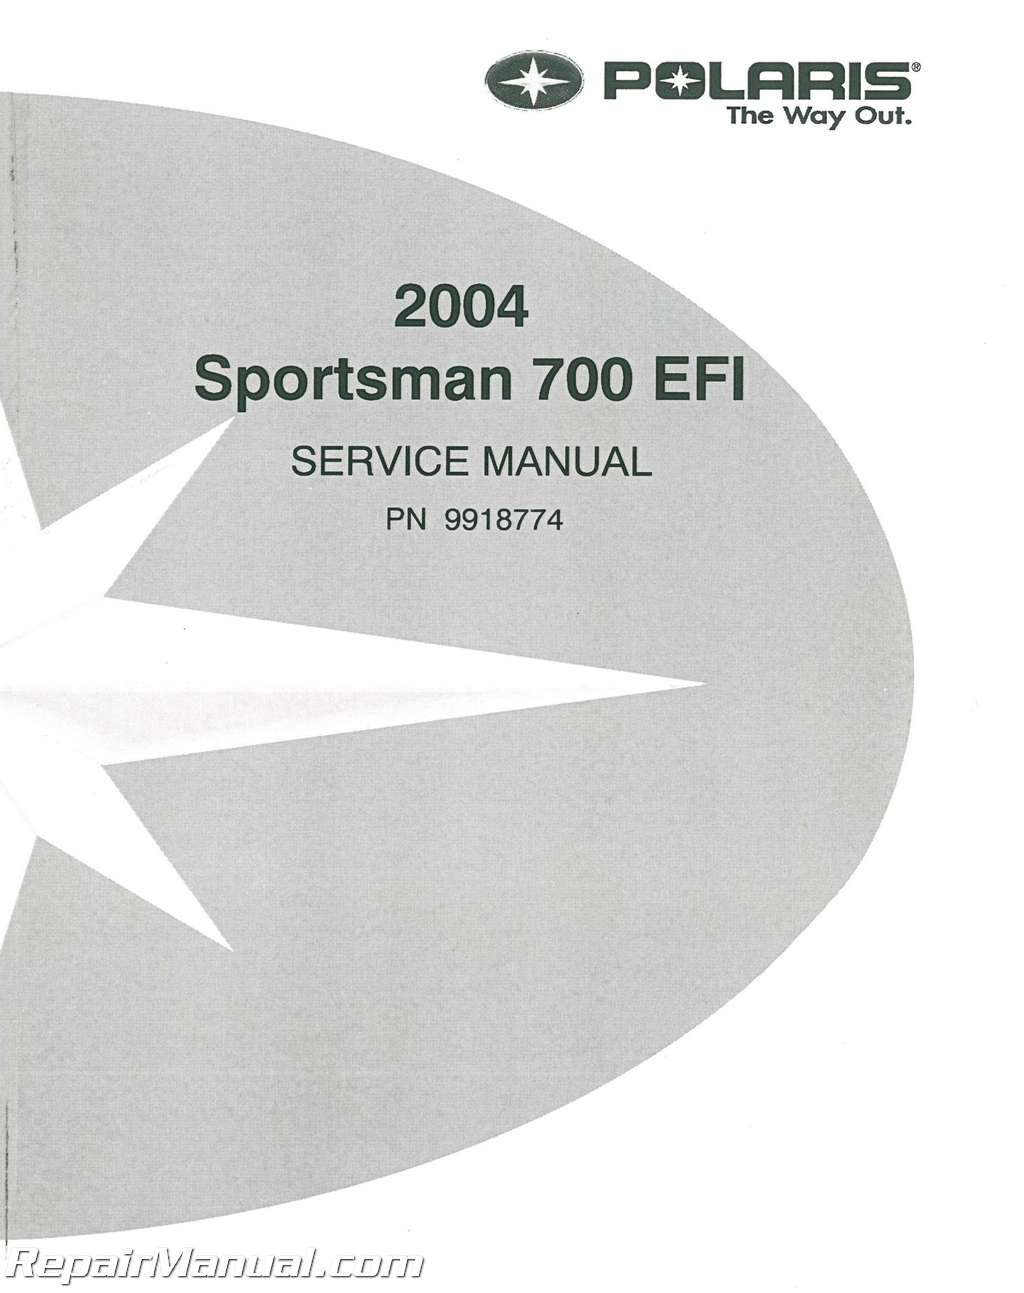 2004 Polaris Sportsman 700 Efi Twin Atv Service Manual